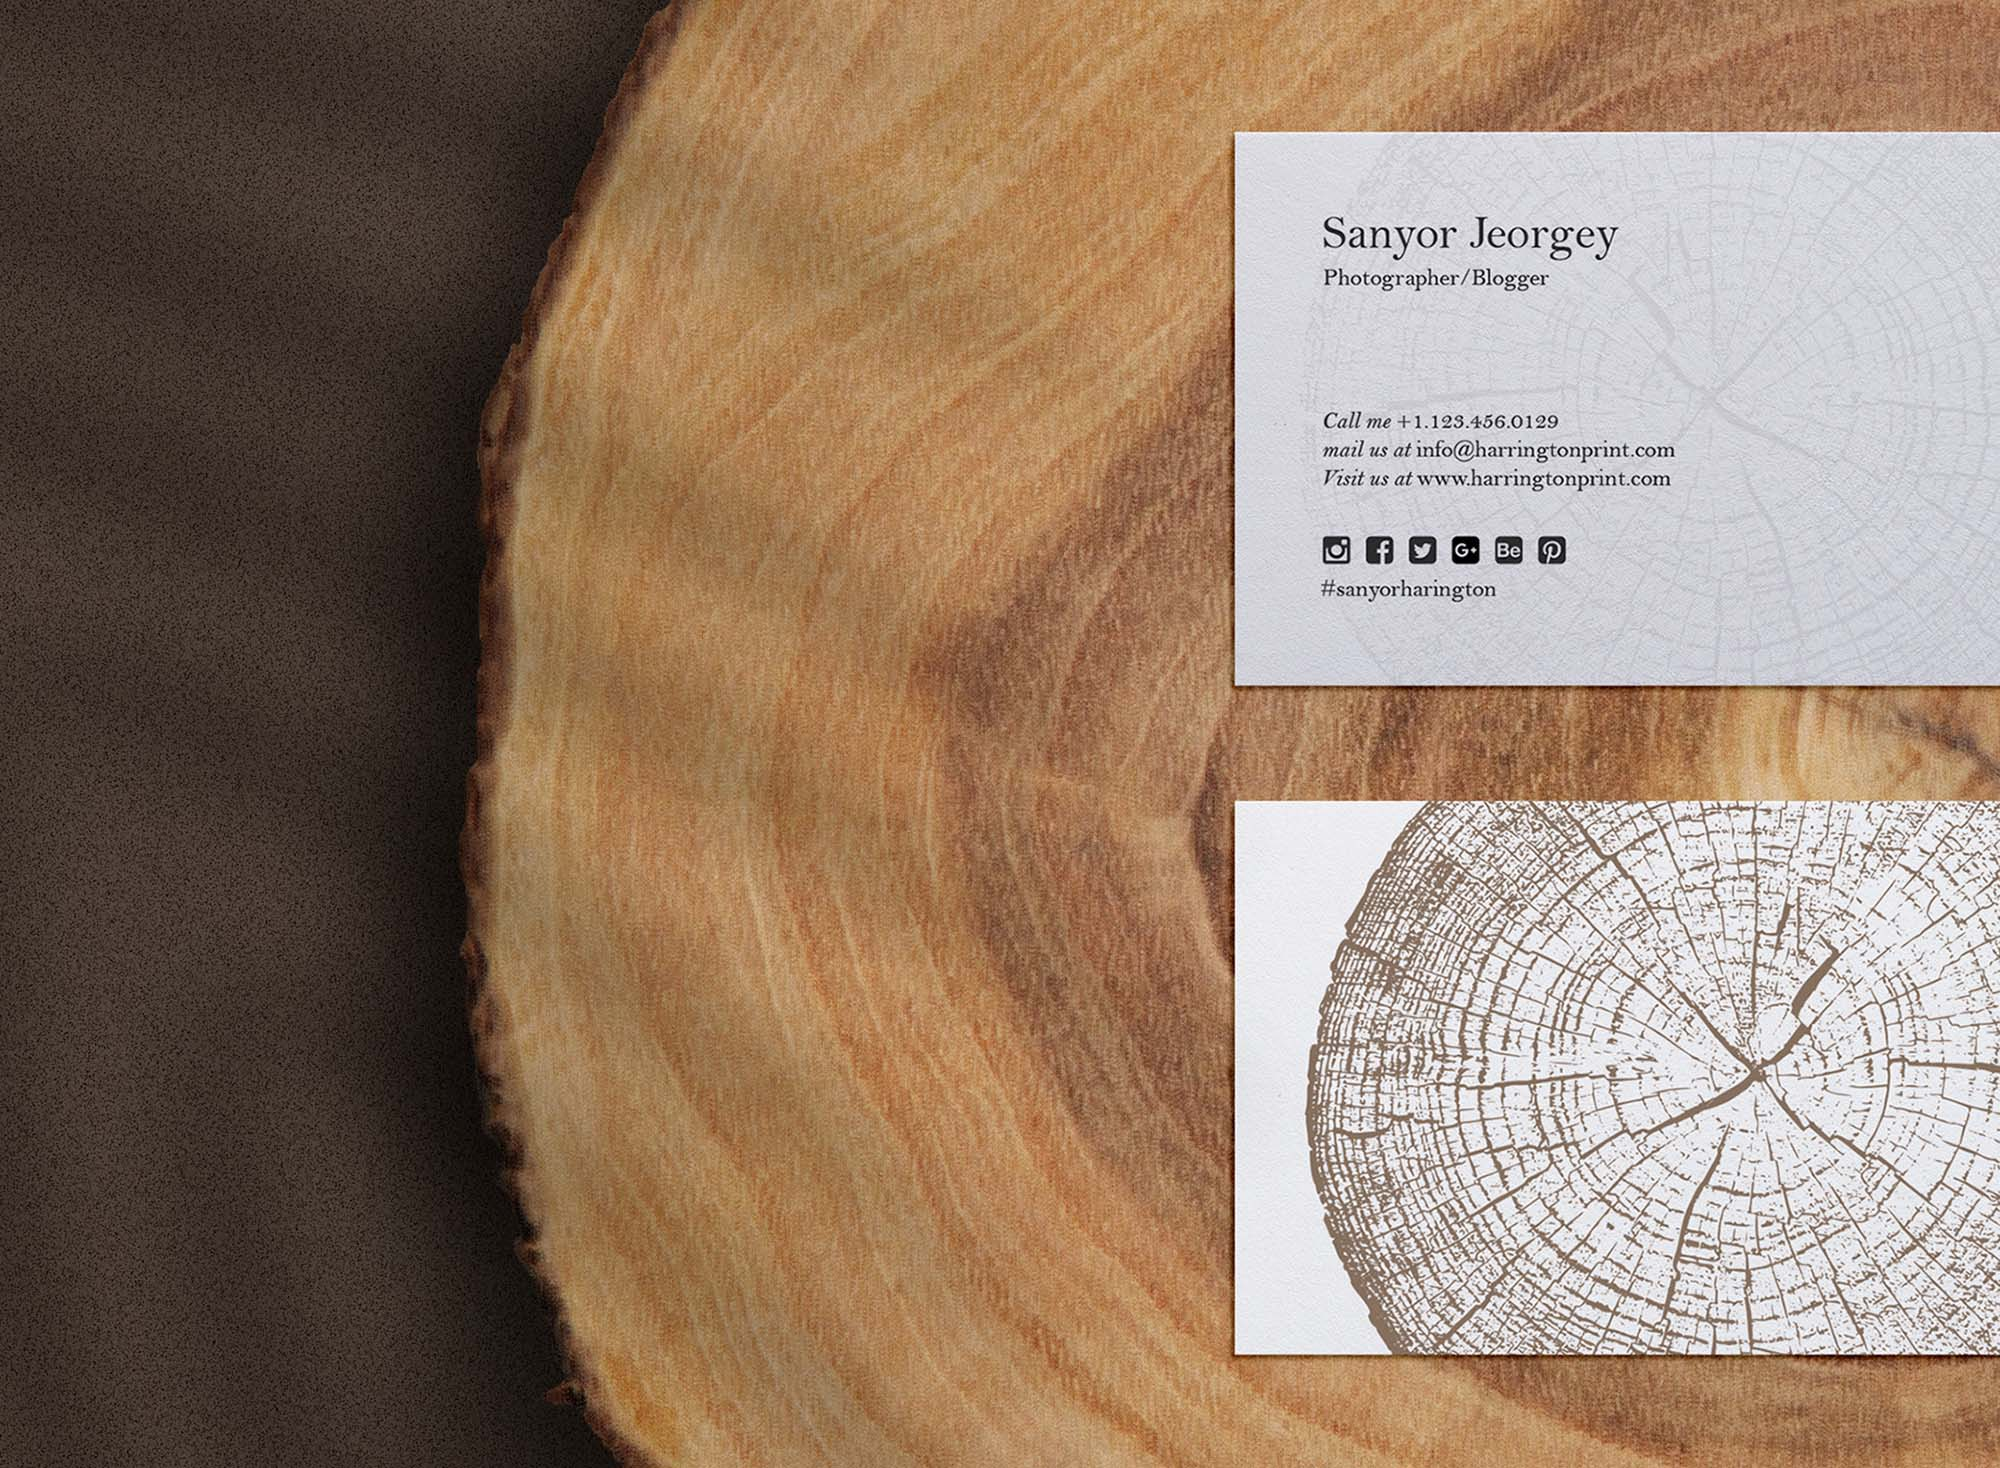 Business Card on Wood Slice Mockup 2